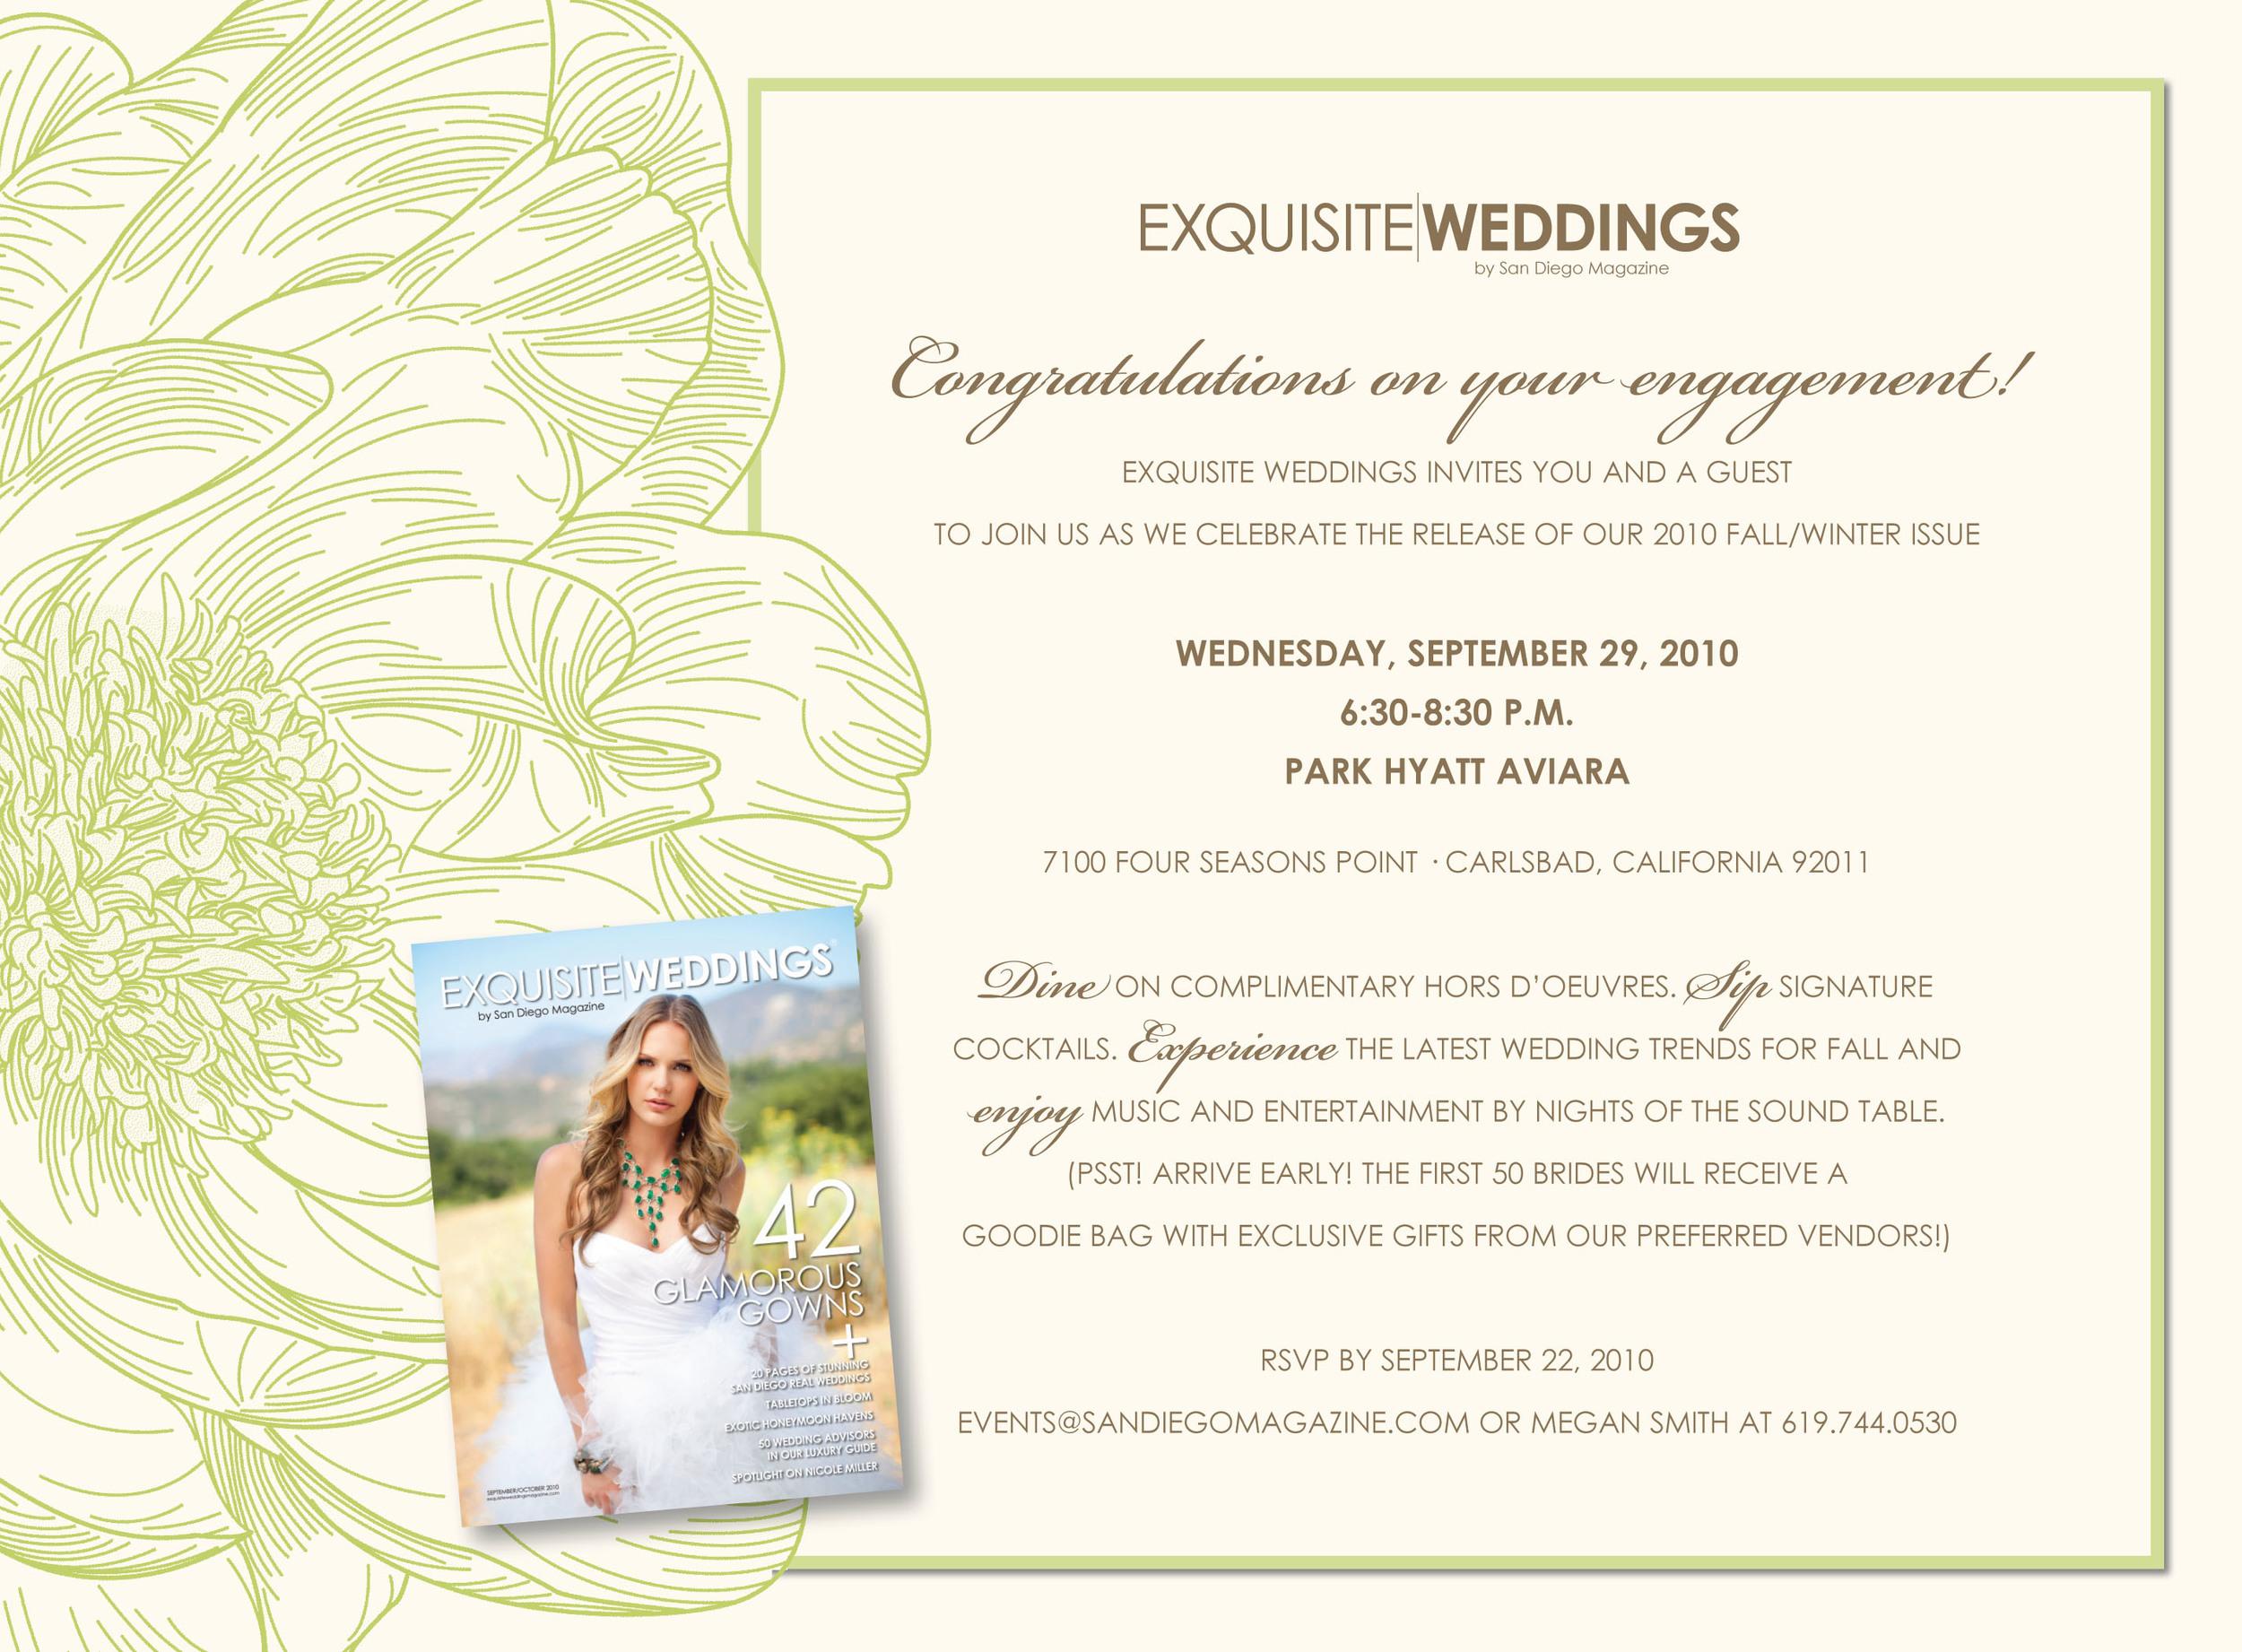 EW Invite-Brides.jpg